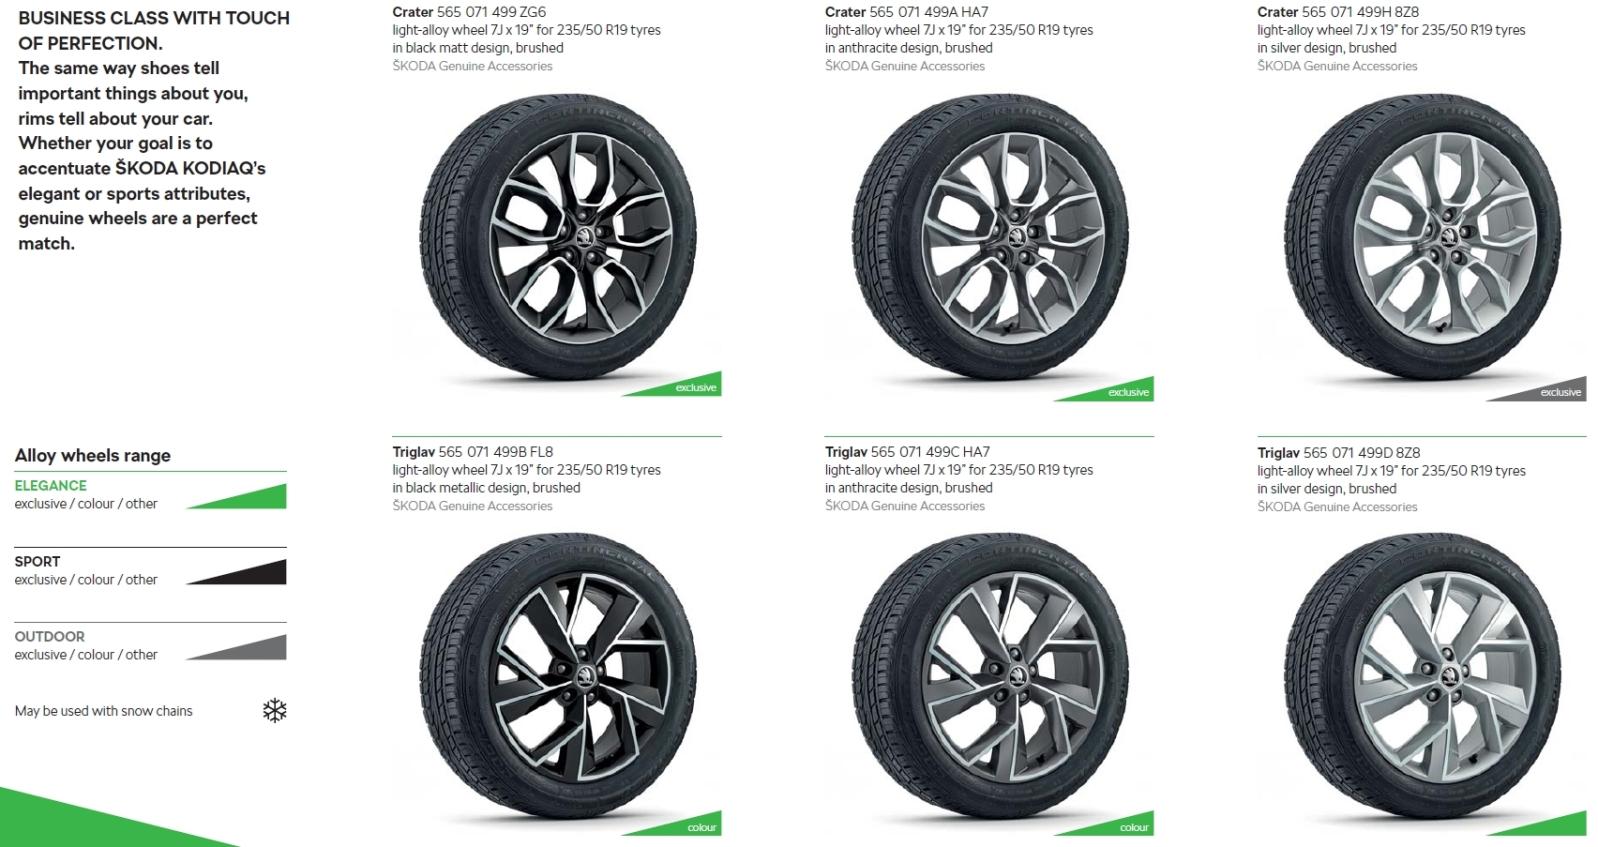 Black Kodiaq >> Owners dealer experience of alloy wheel upgrade (anthracite/black) - Skoda Kodiaq - BRISKODA